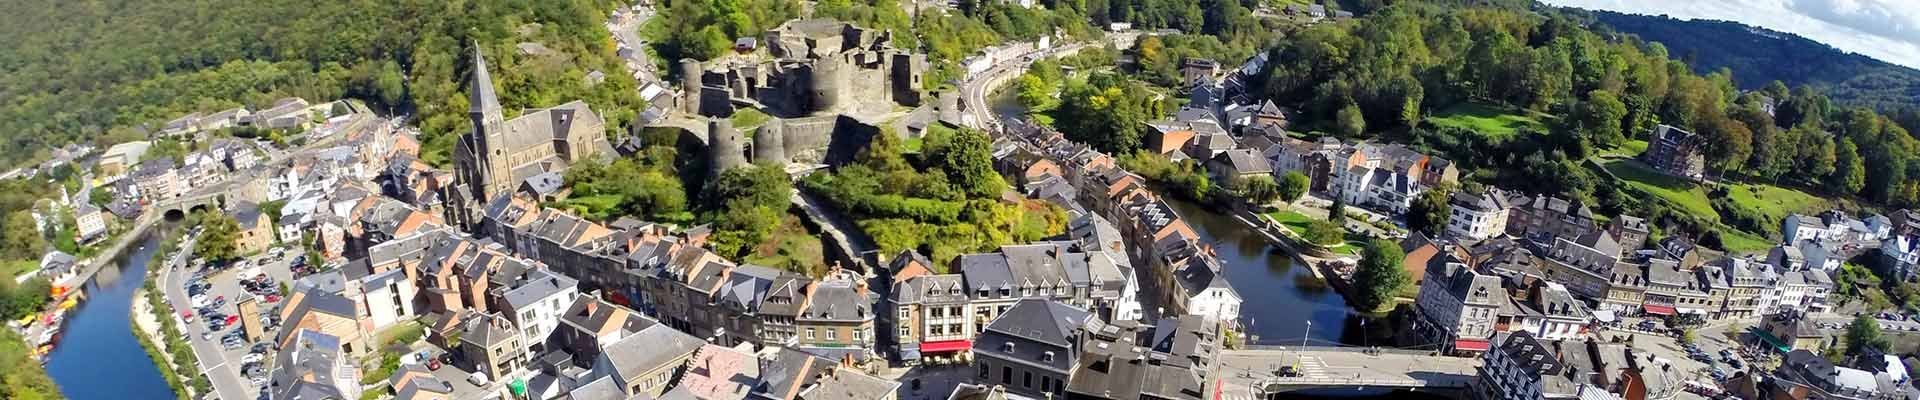 Eenoudervakantie La Roche-en-Ardenne